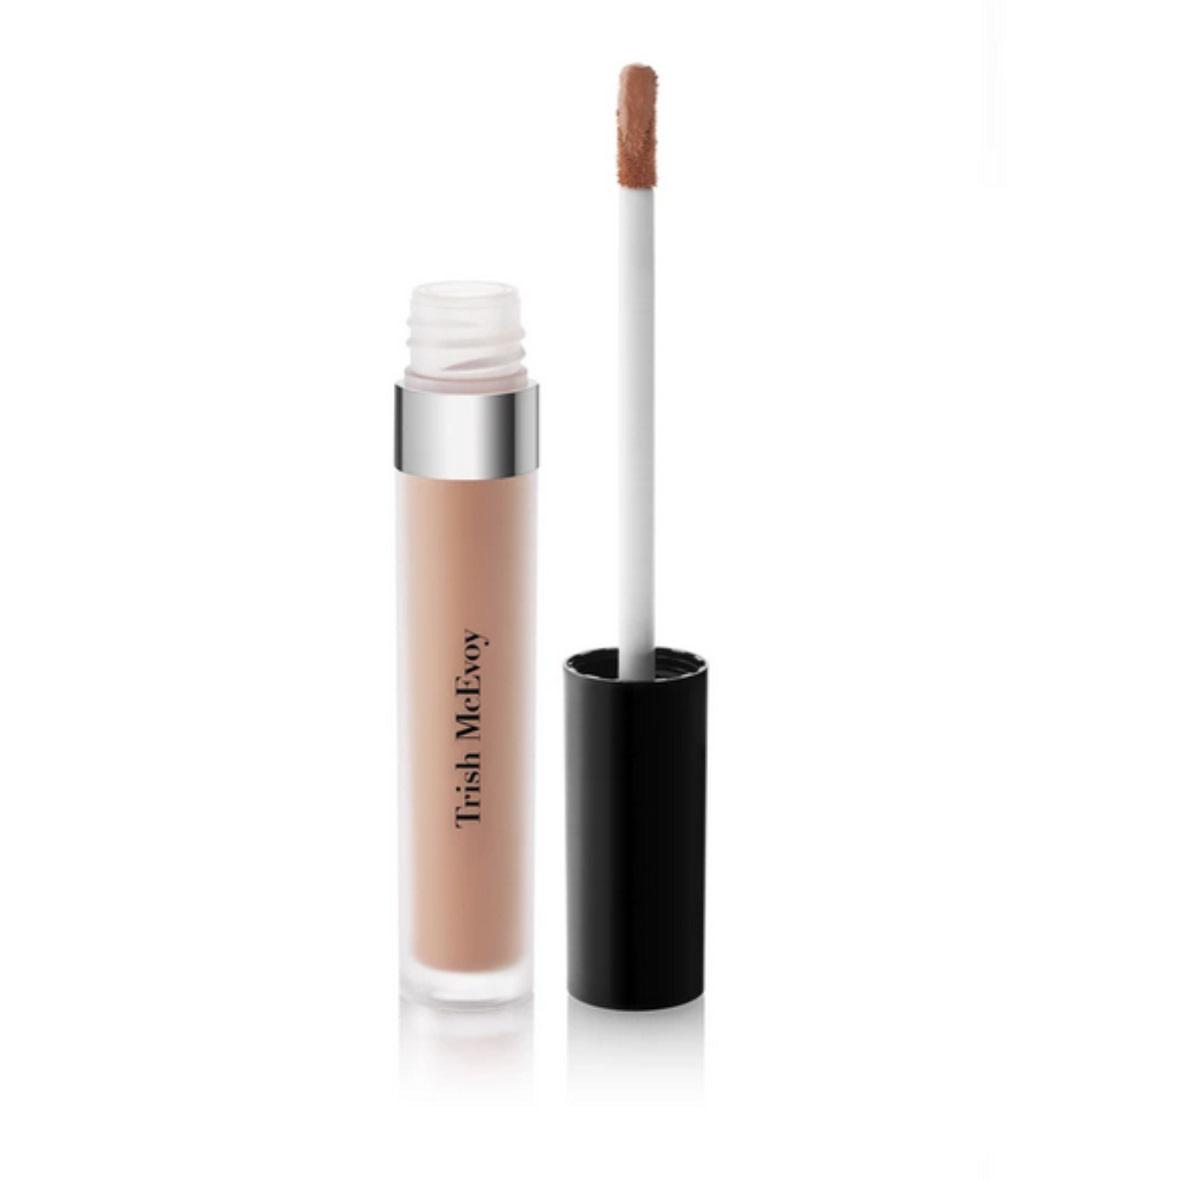 Trish McEvoy Trish McEvoy Liquid Lip Color Matte Nude